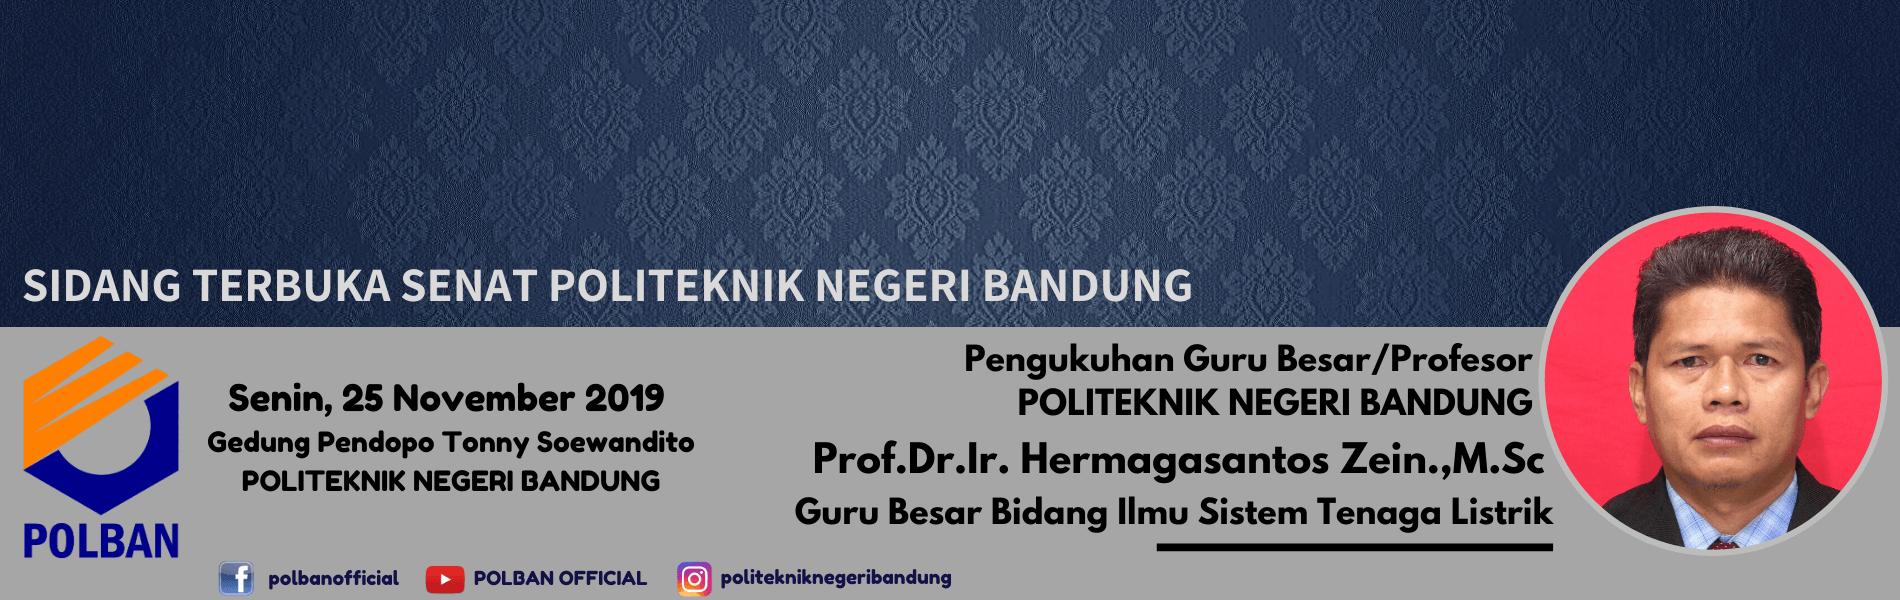 #pengukuhangurubesar/profesor #profesorke-2polban